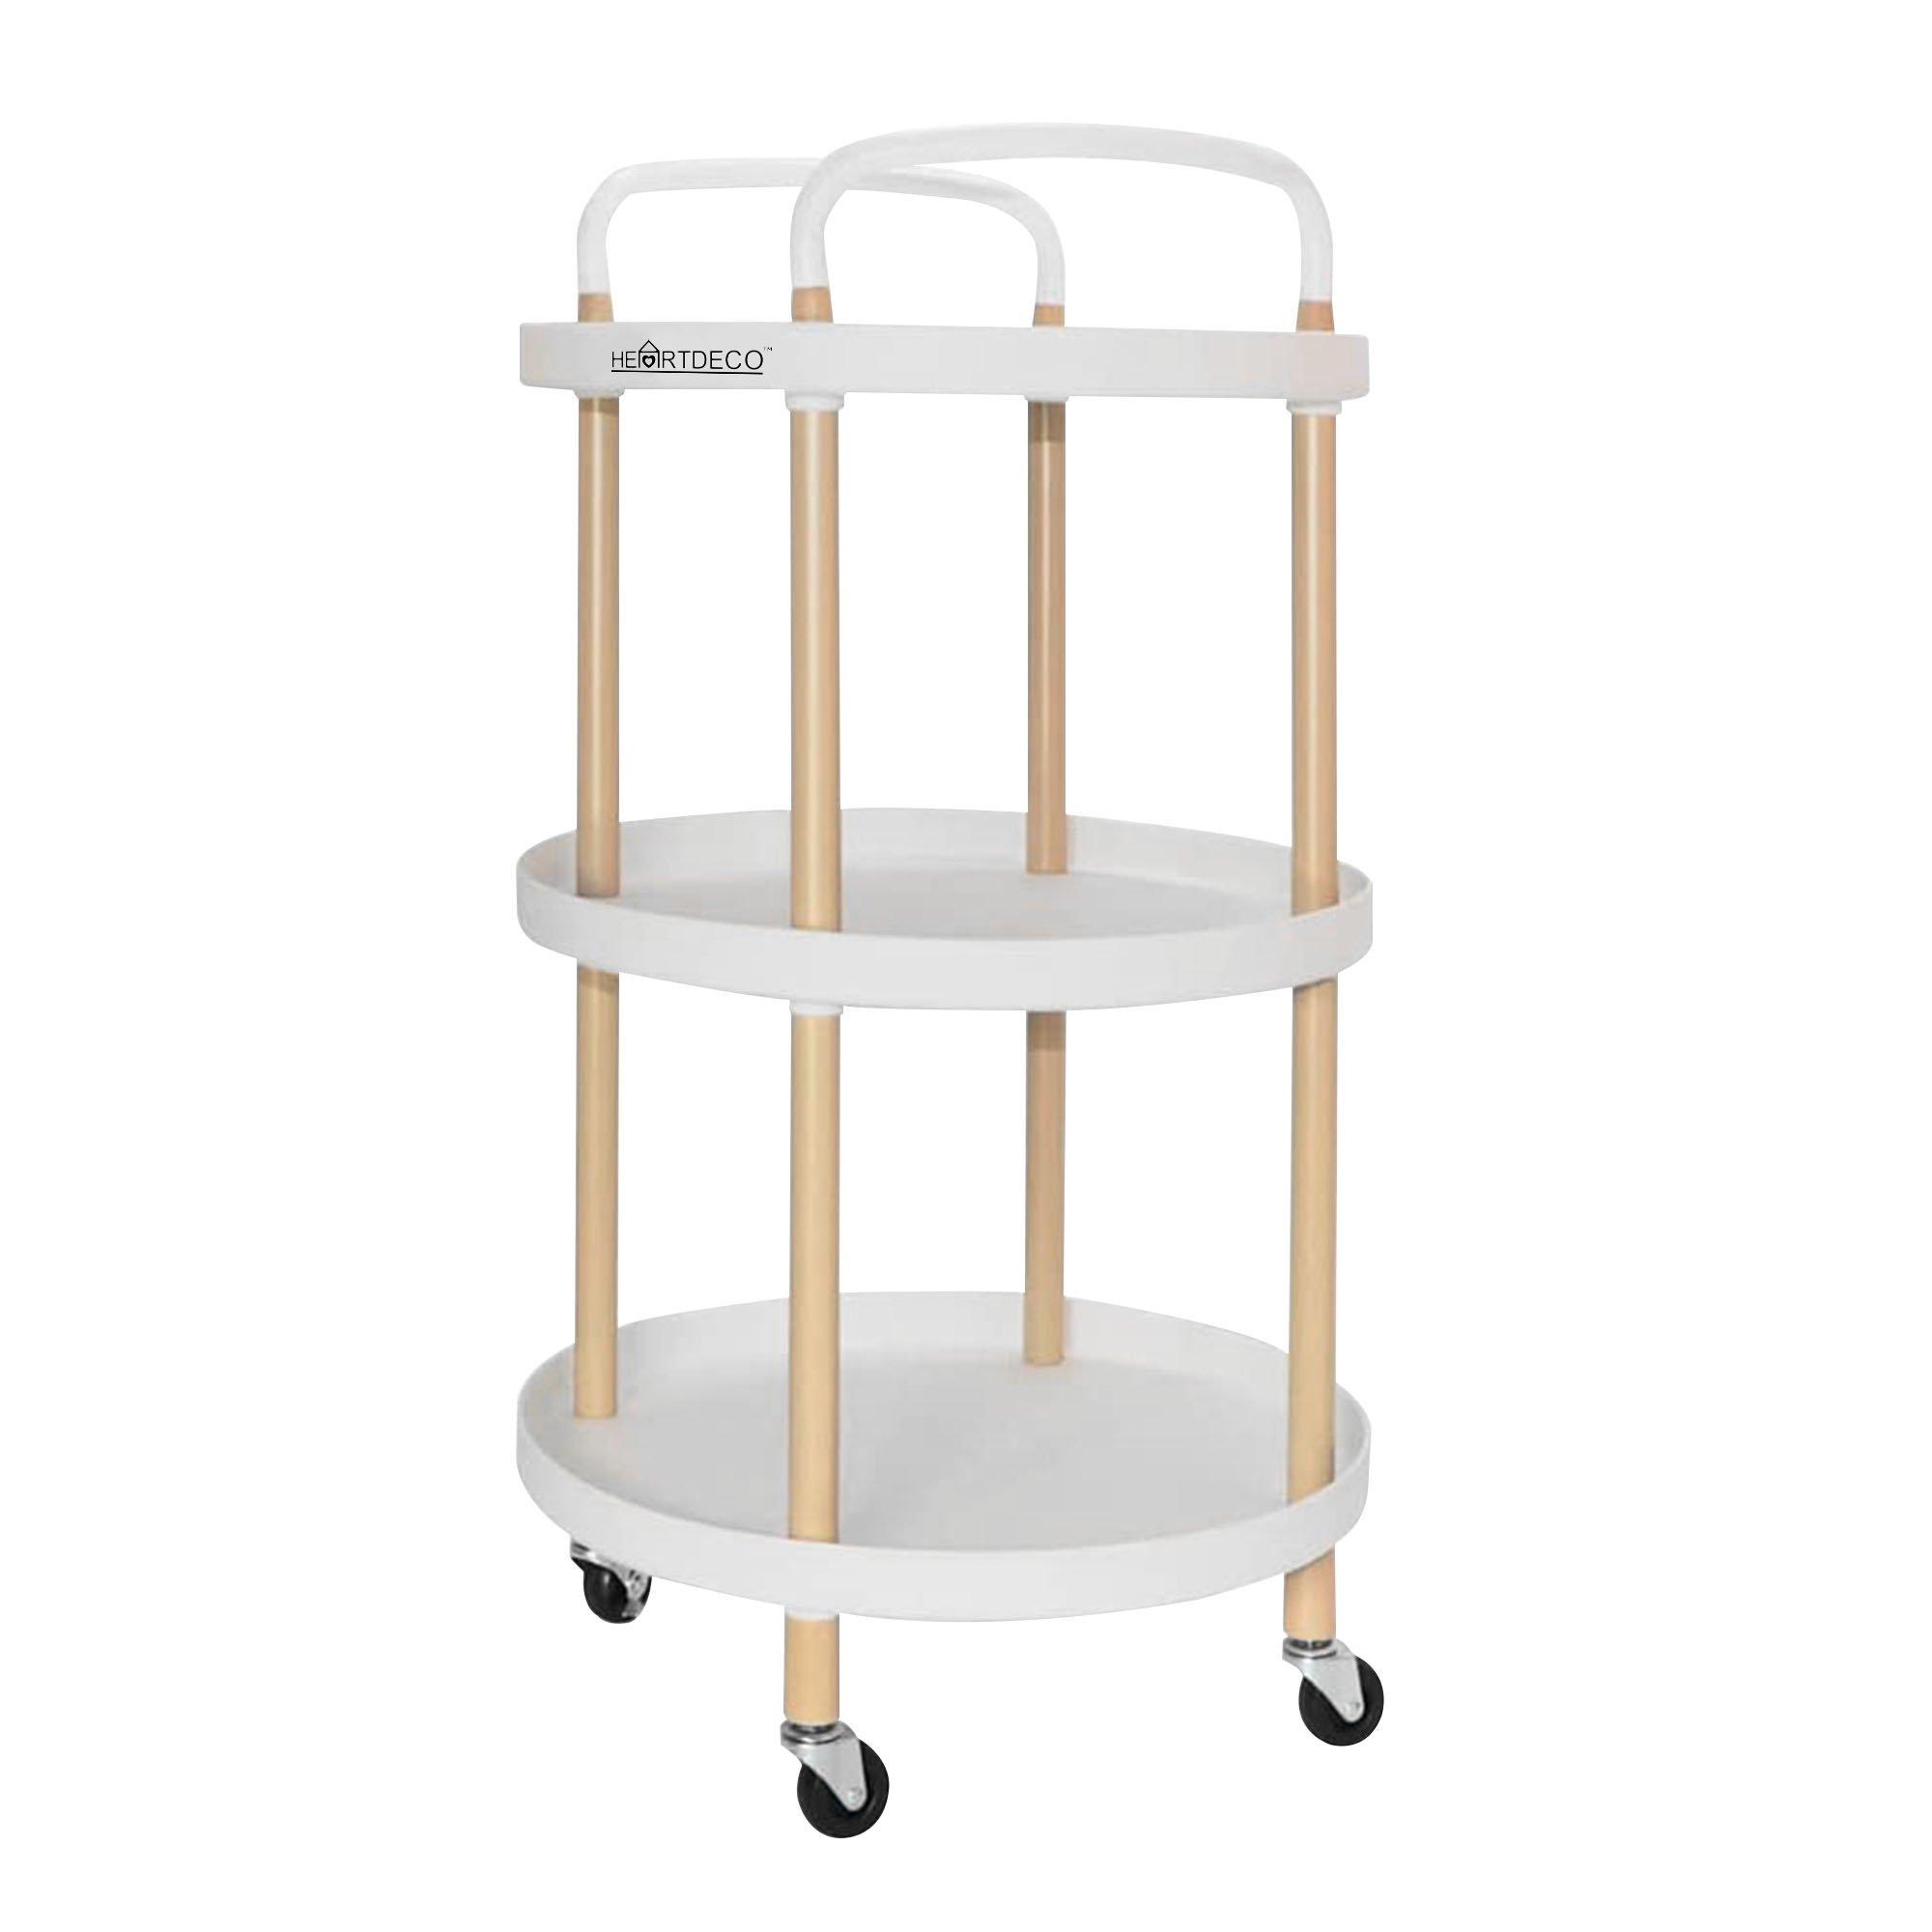 3 Tier Rolling Cart Storage Trolley